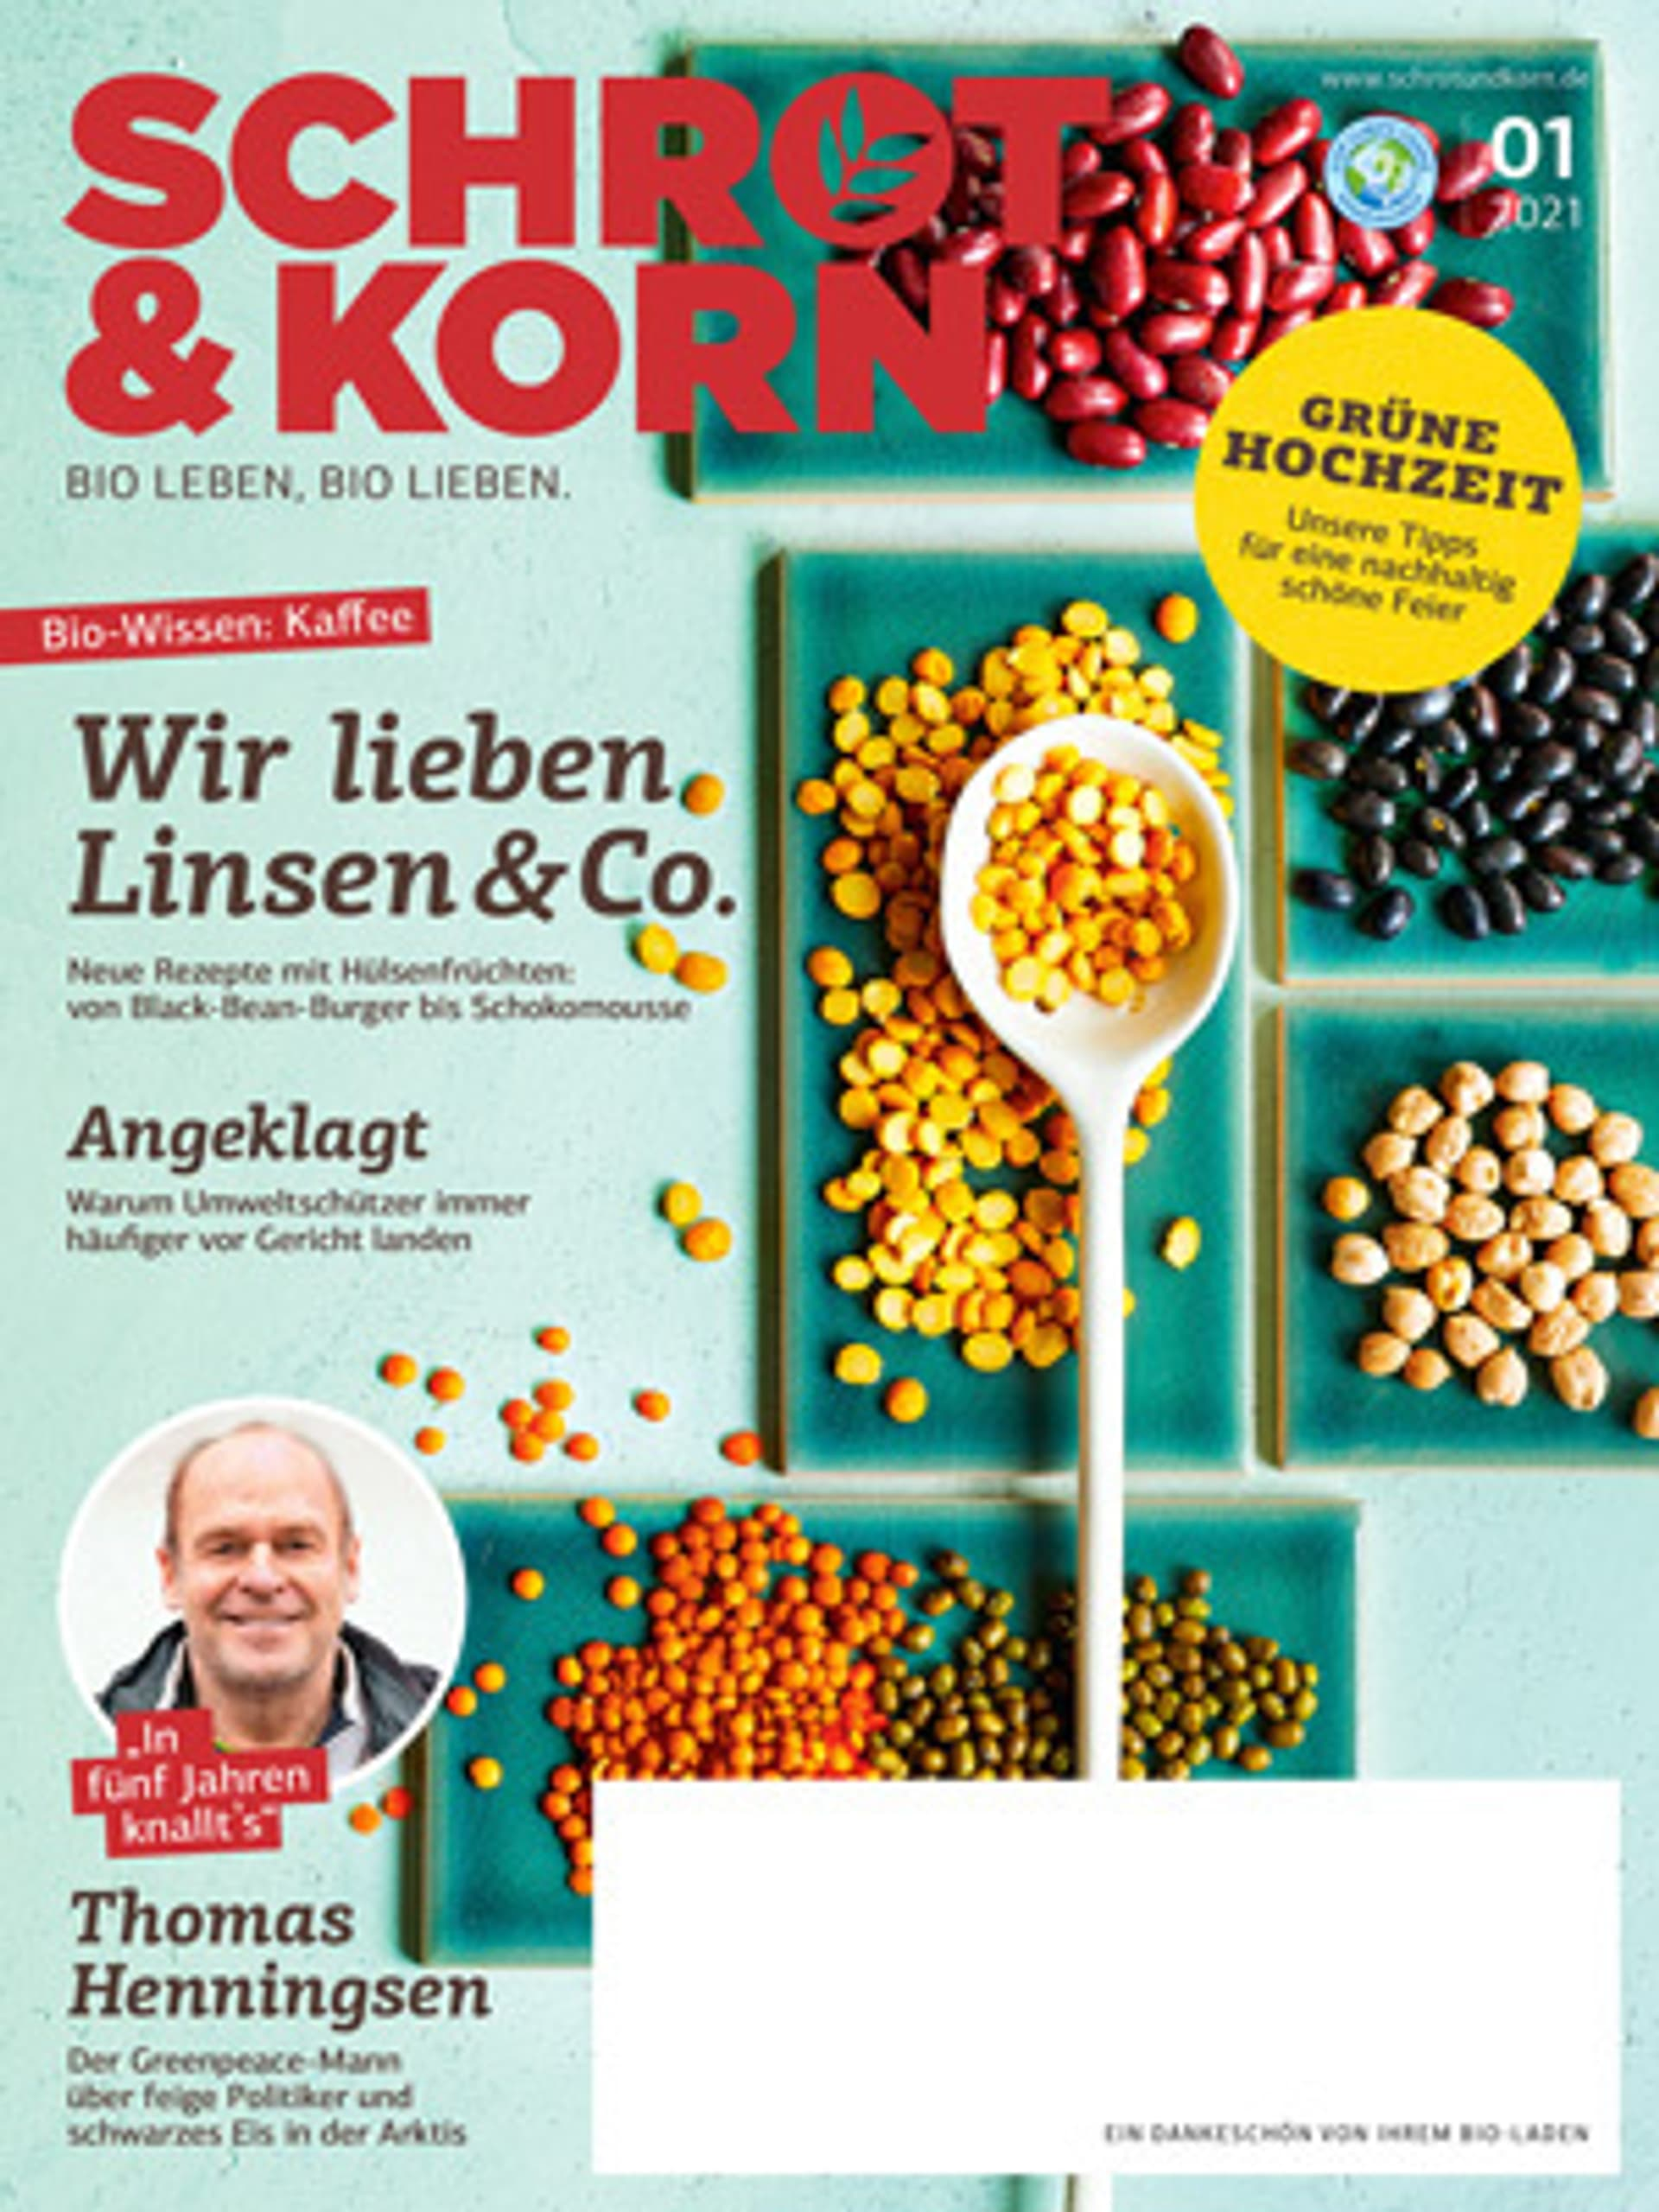 Schrot&Korn 01/2021